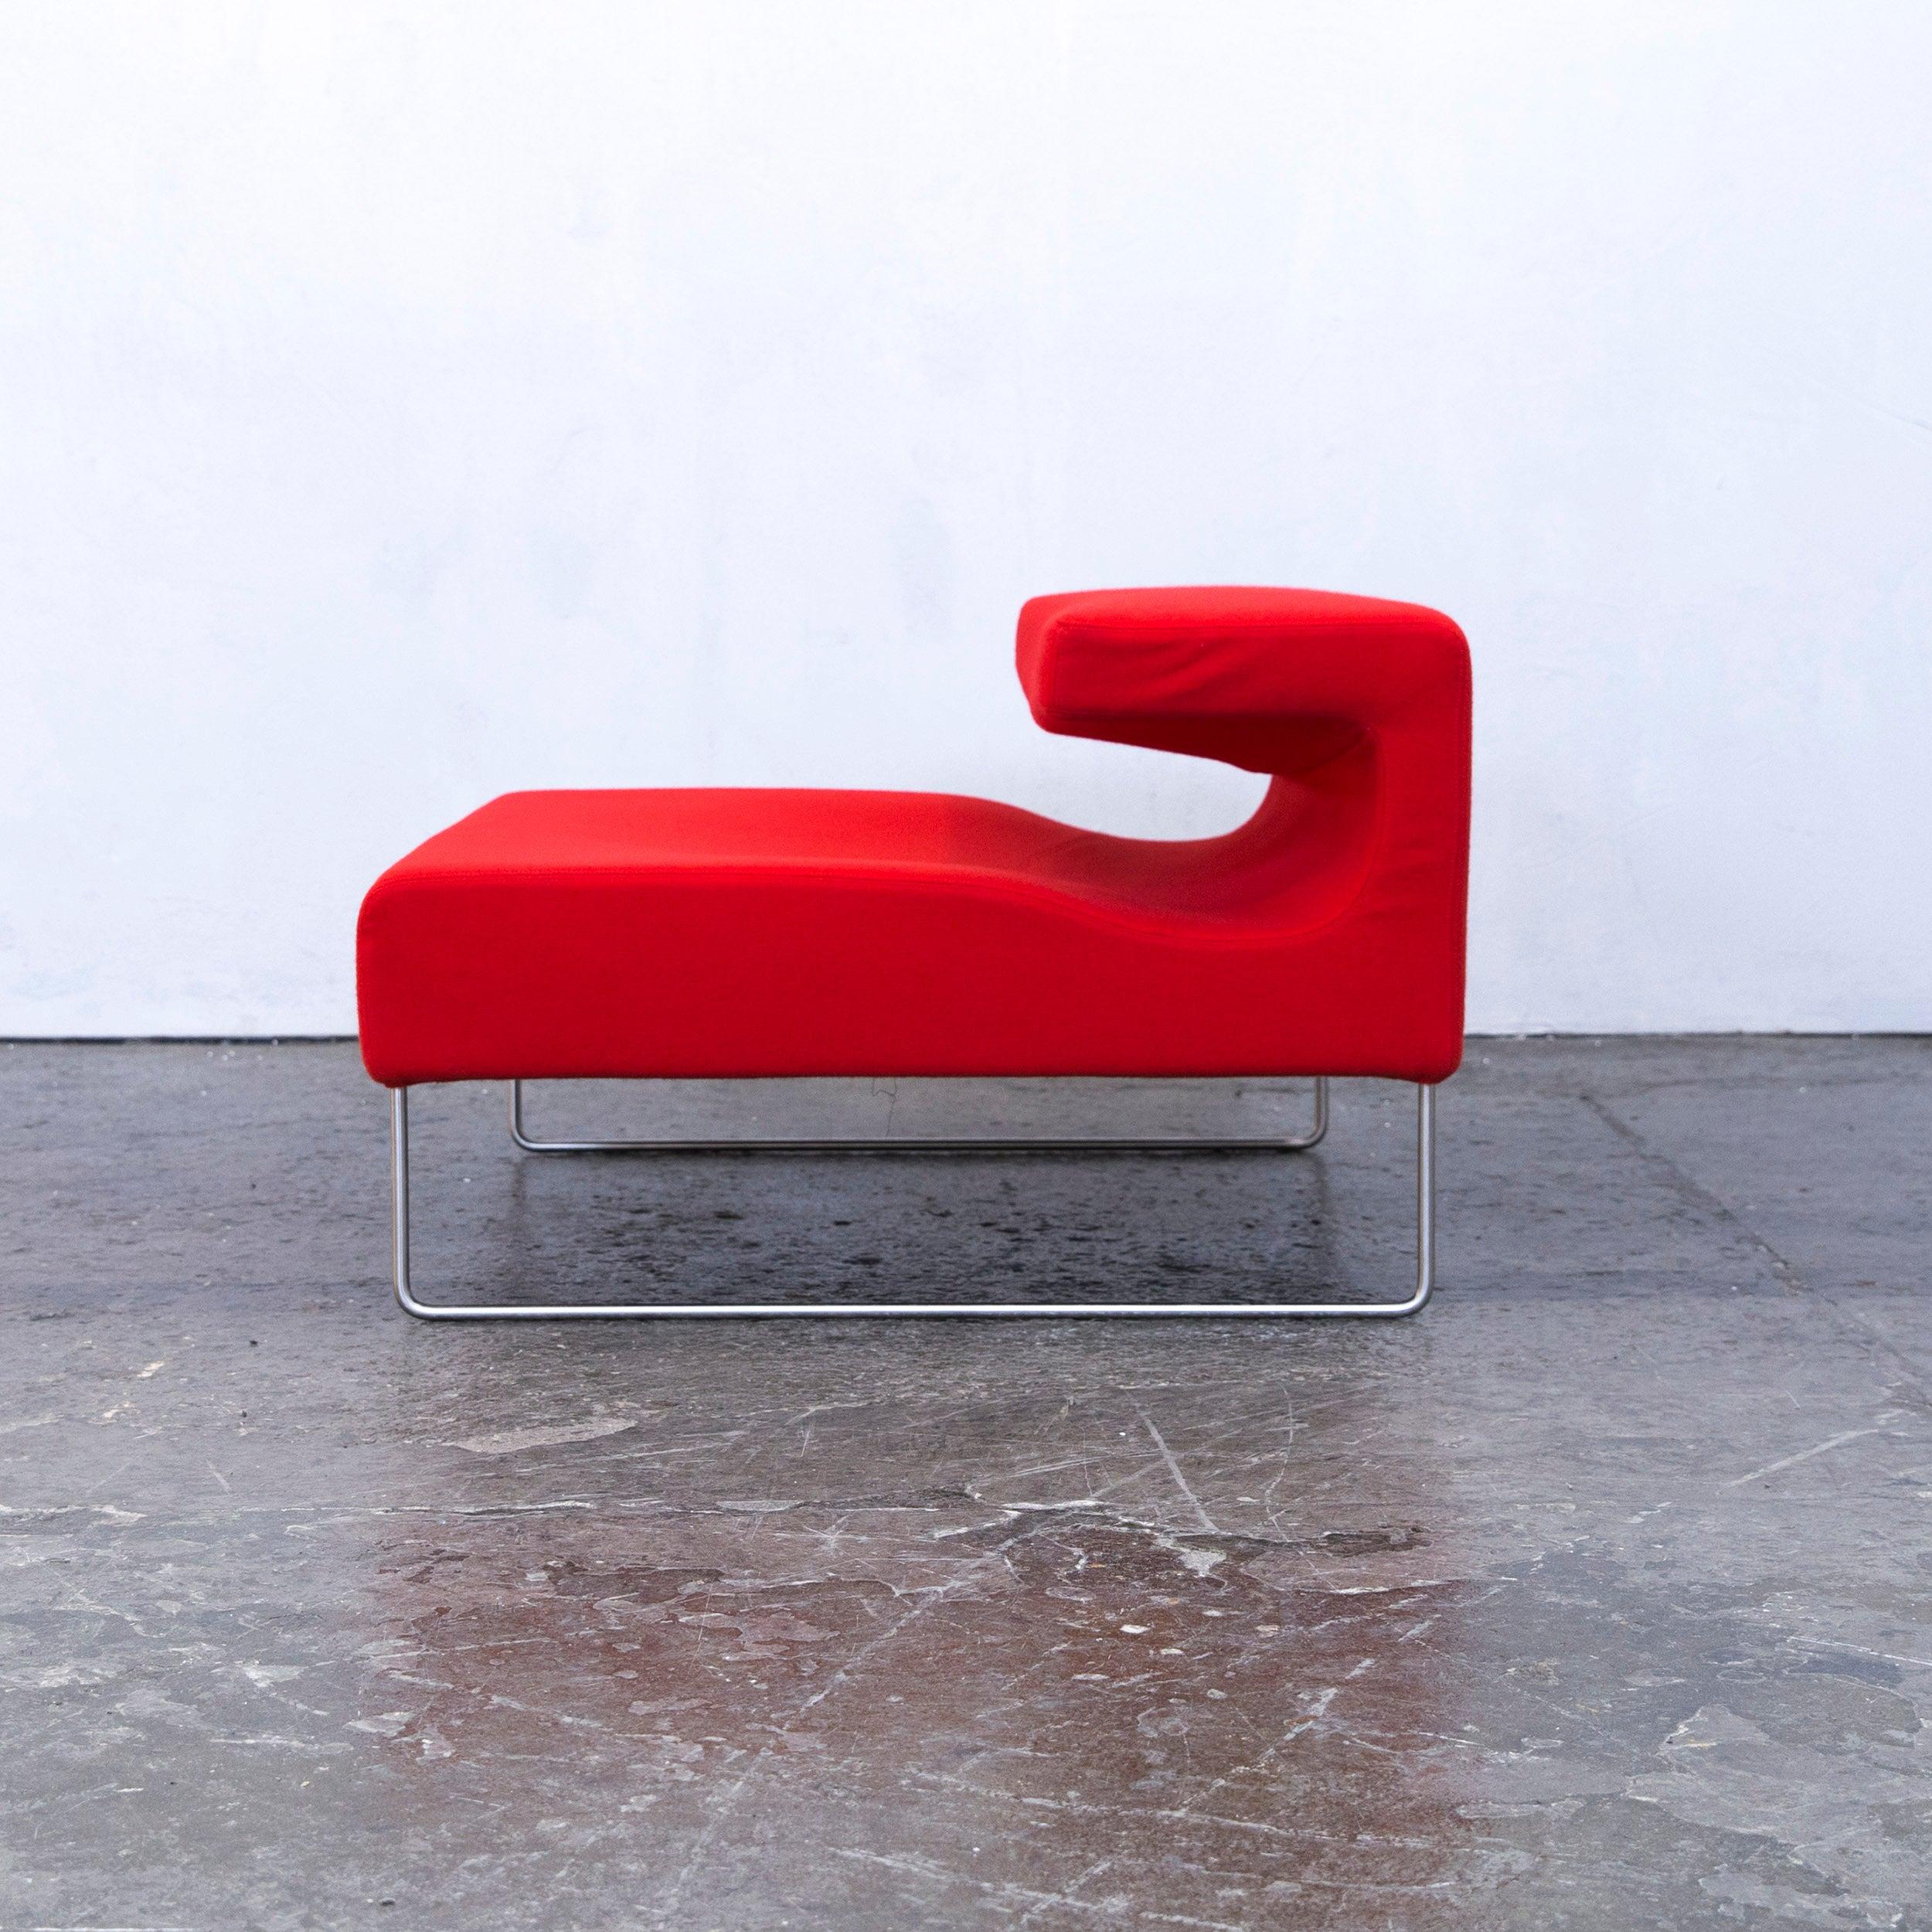 designer sessel husk indoor outdoor, moroso lowseat designer chair fabric red one-seat microfibre couch, Möbel ideen